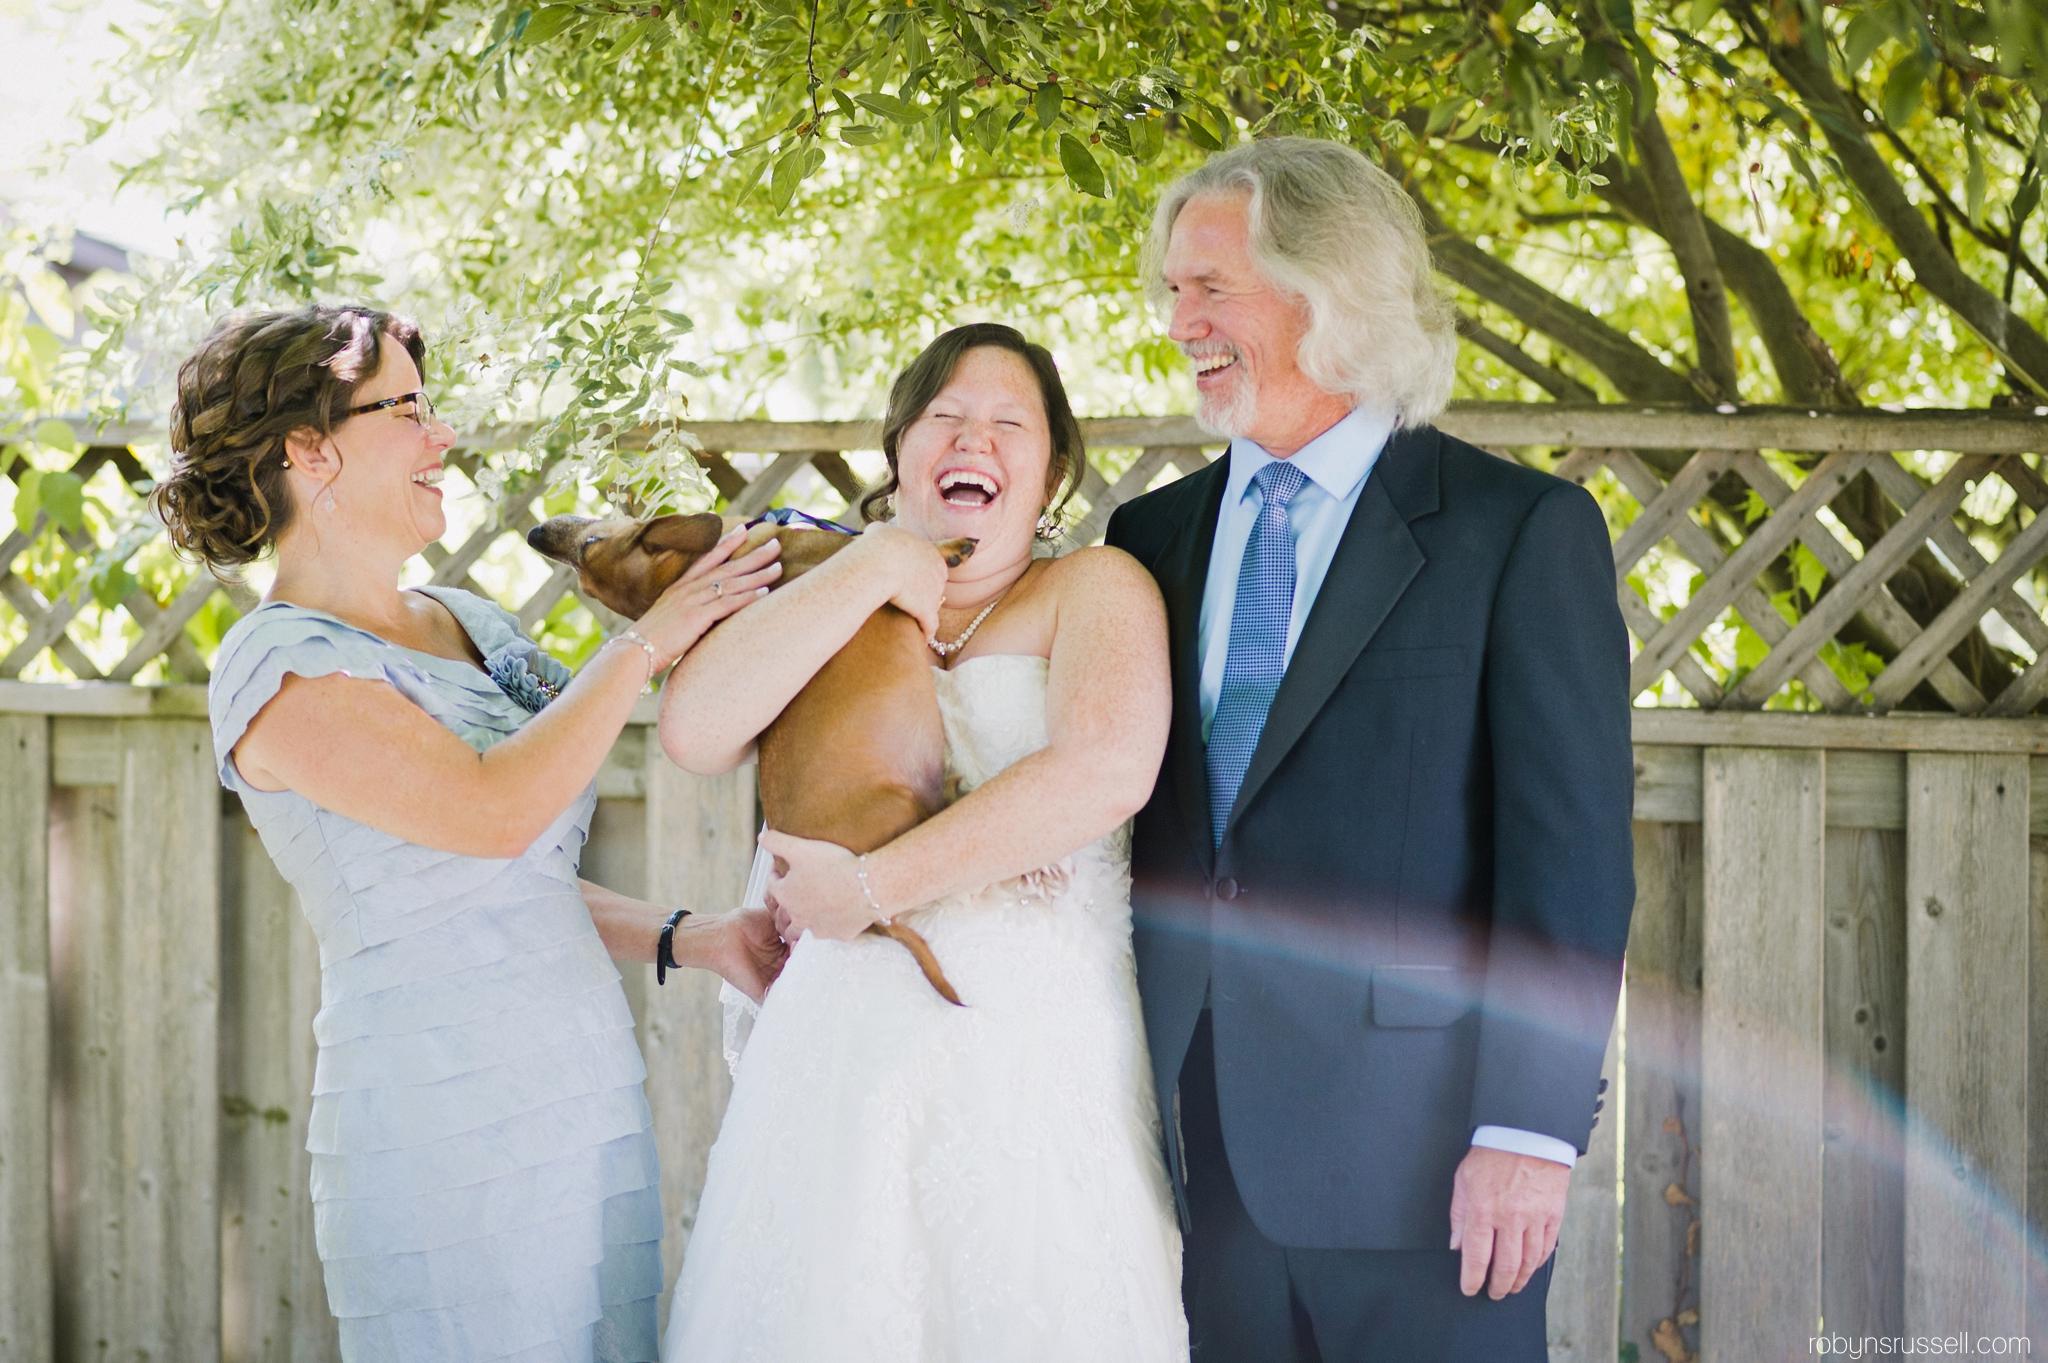 5-bride-and-family-with-dog-burlington-wedding.jpg